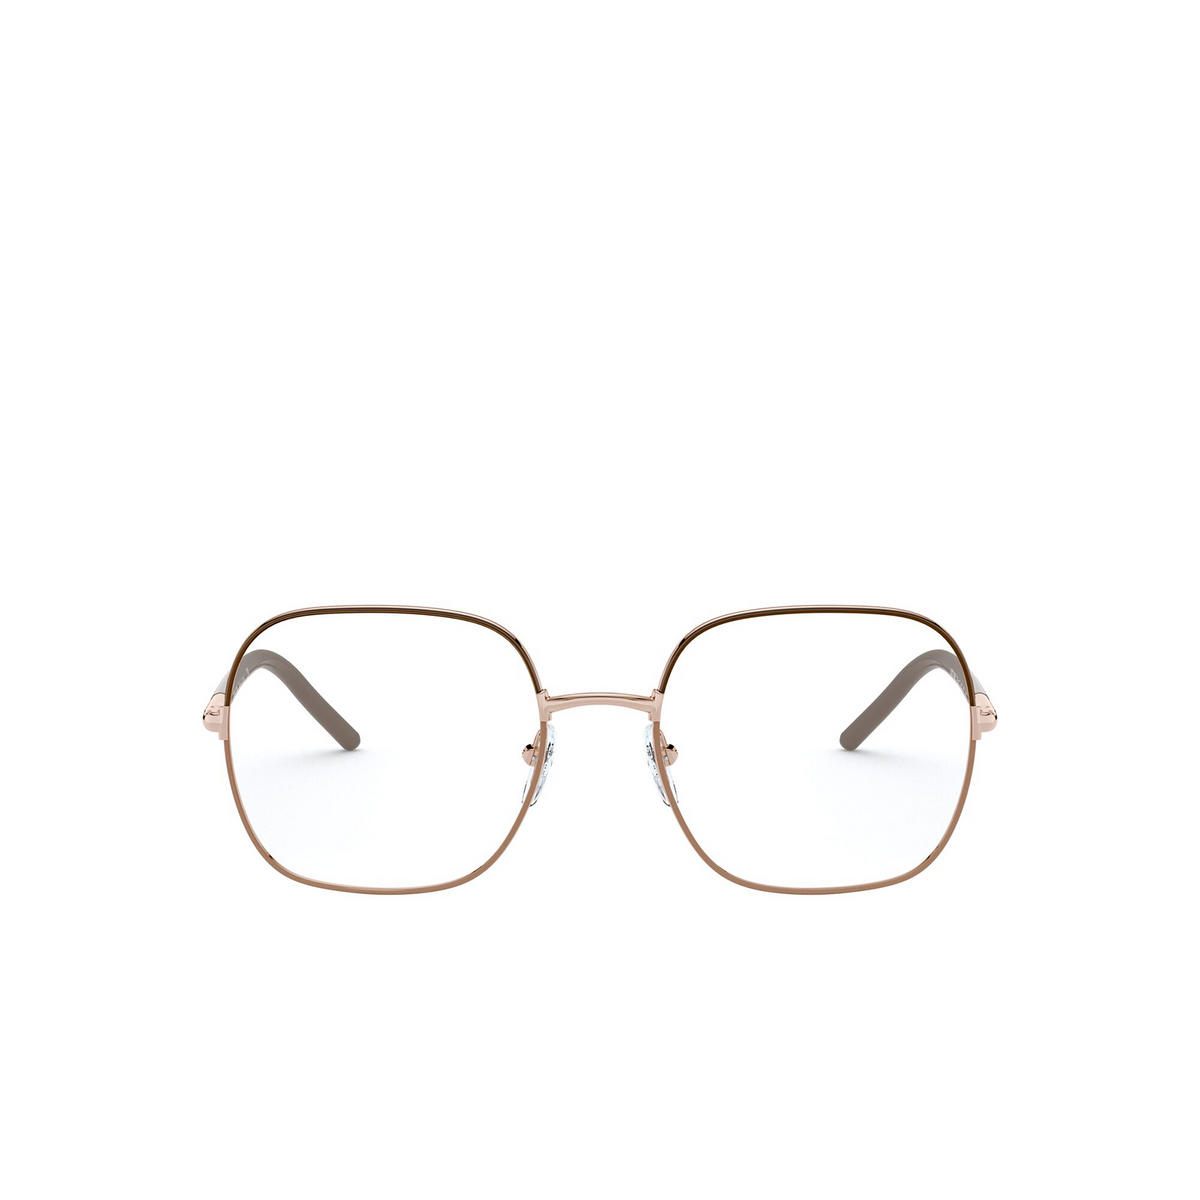 Prada® Rectangle Eyeglasses: PR 56WV color Brown / Beige 02H1O1 - front view.